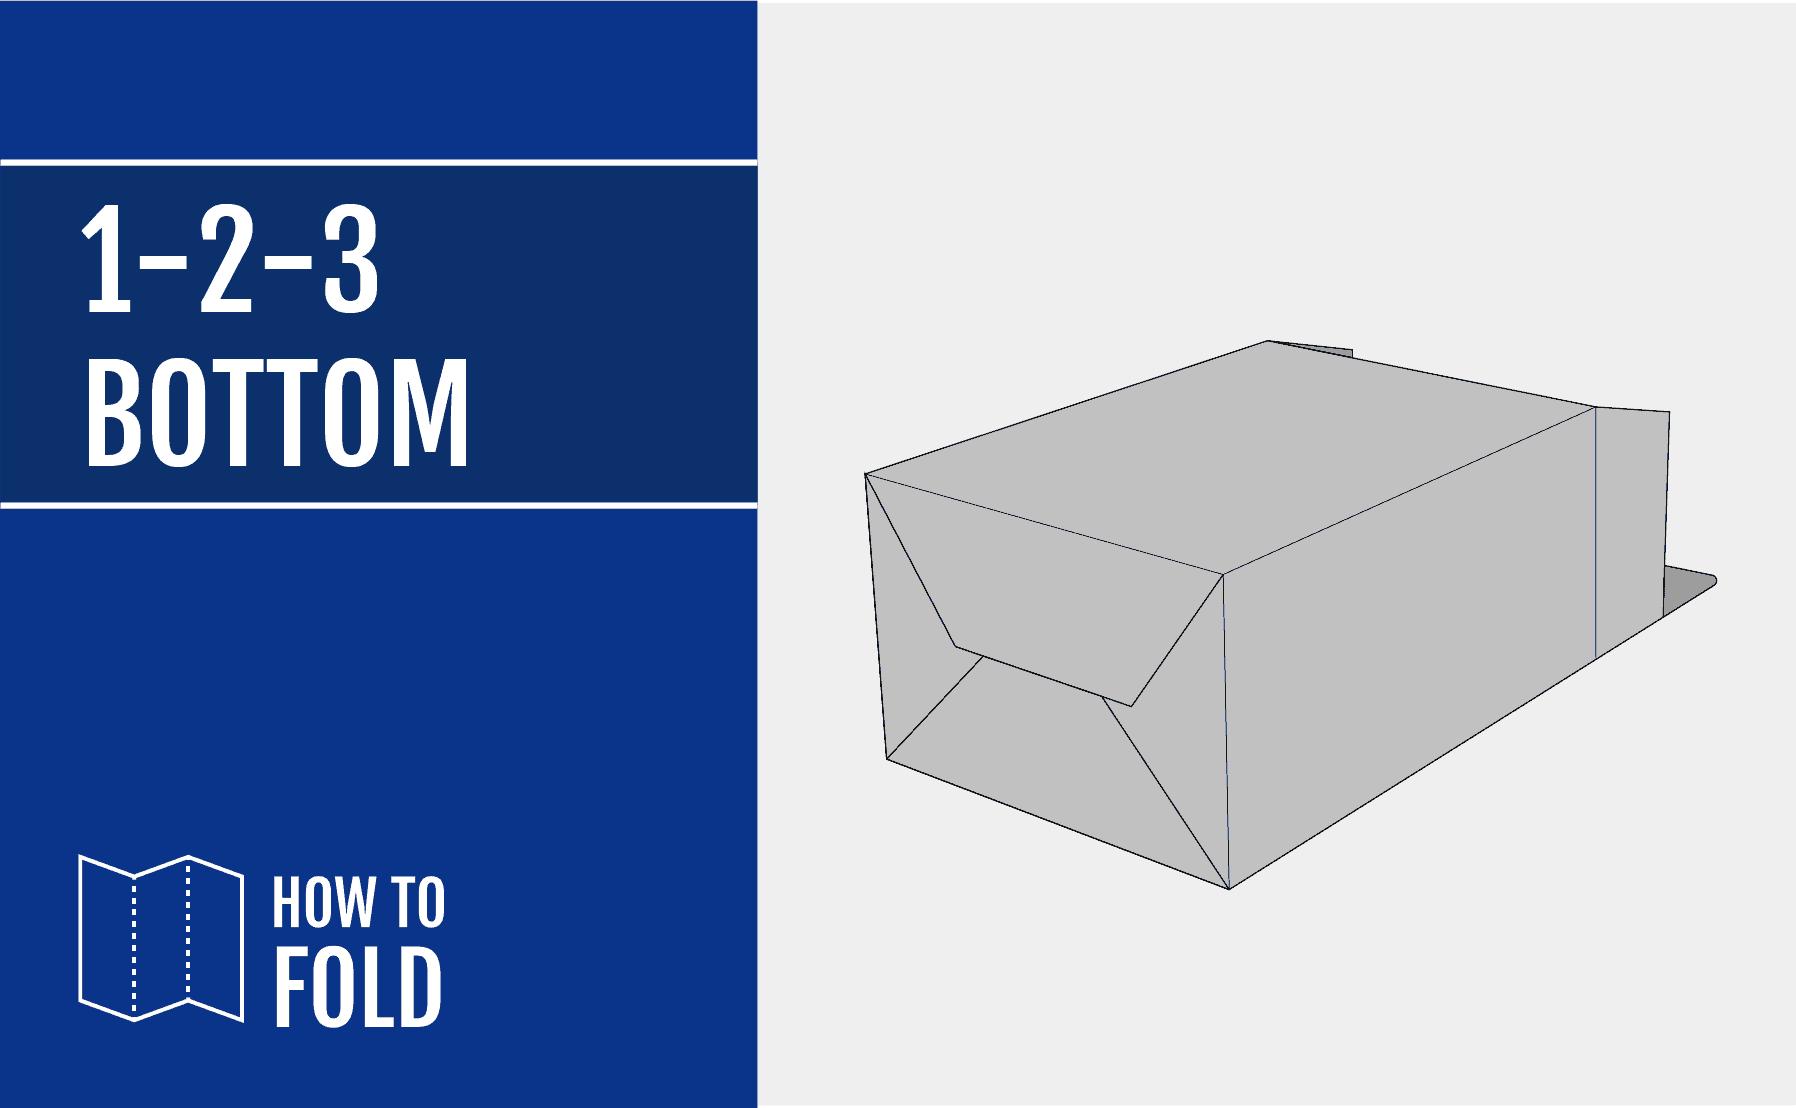 1-2-3-Bottom box how to fold